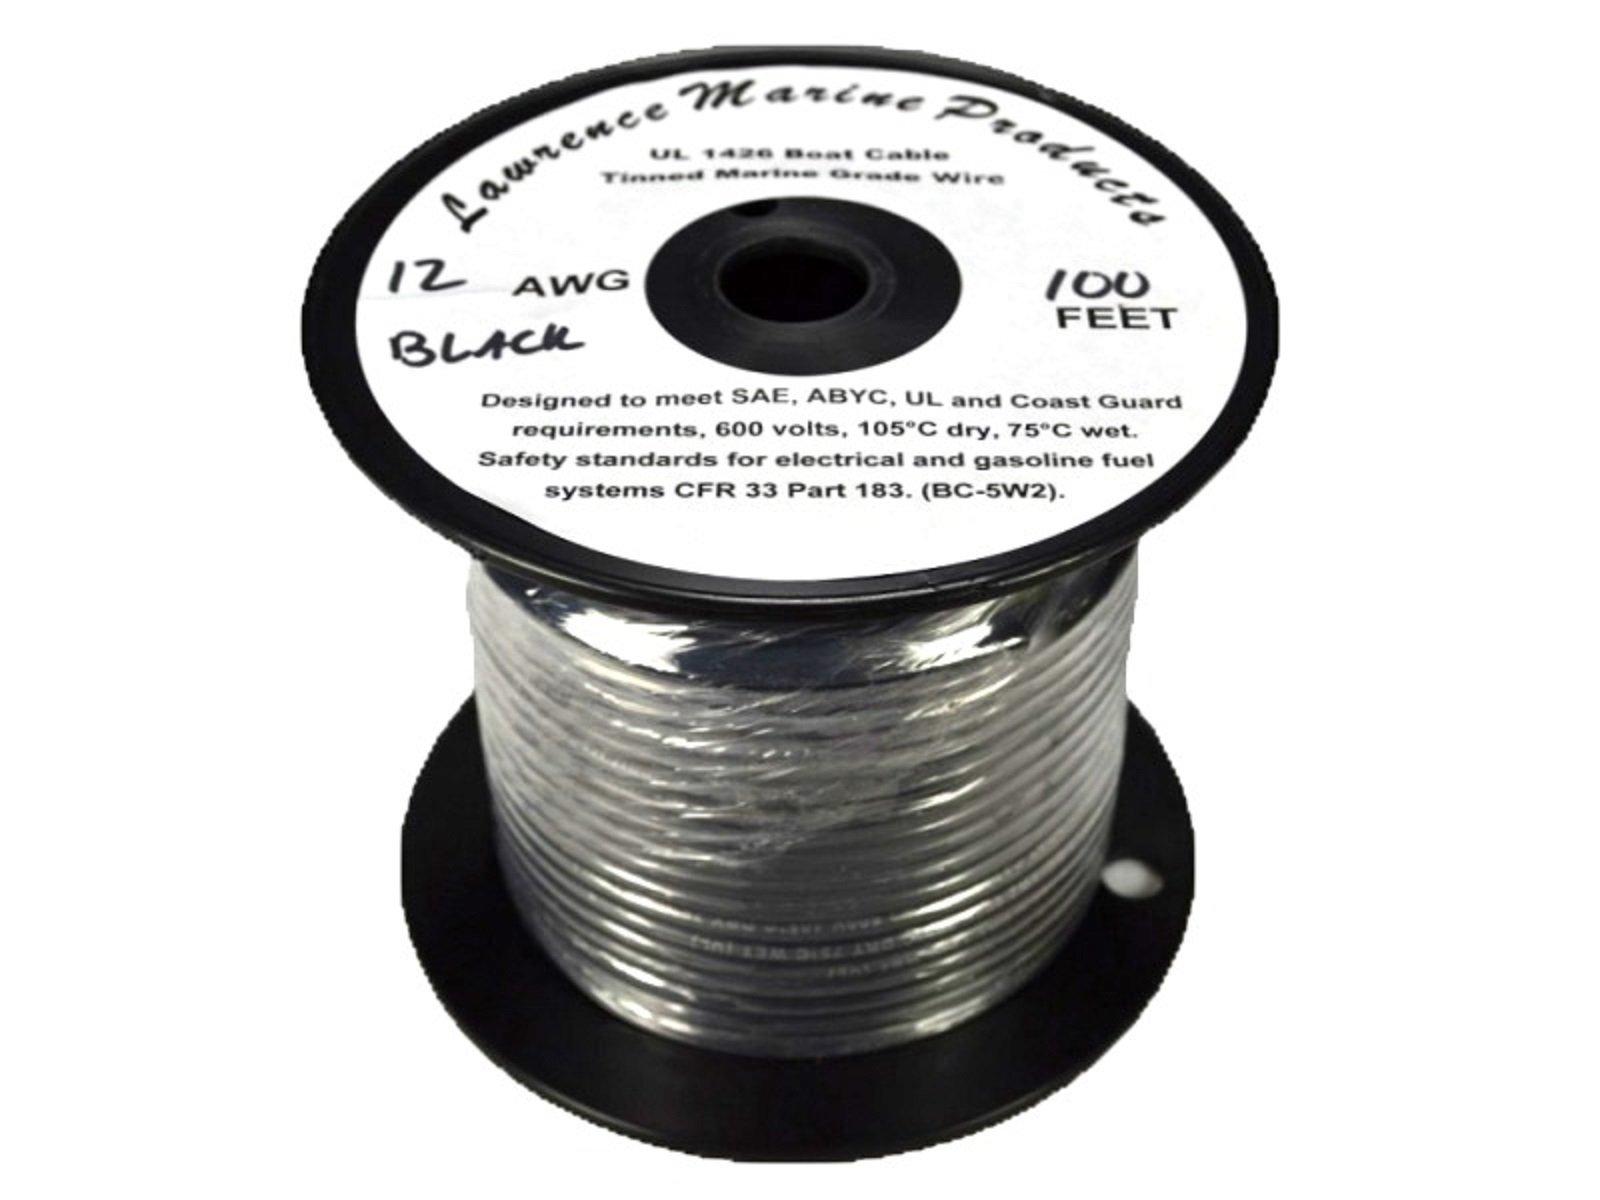 12 AWG Tinned Marine Primary Wire, Black, 100 Feet